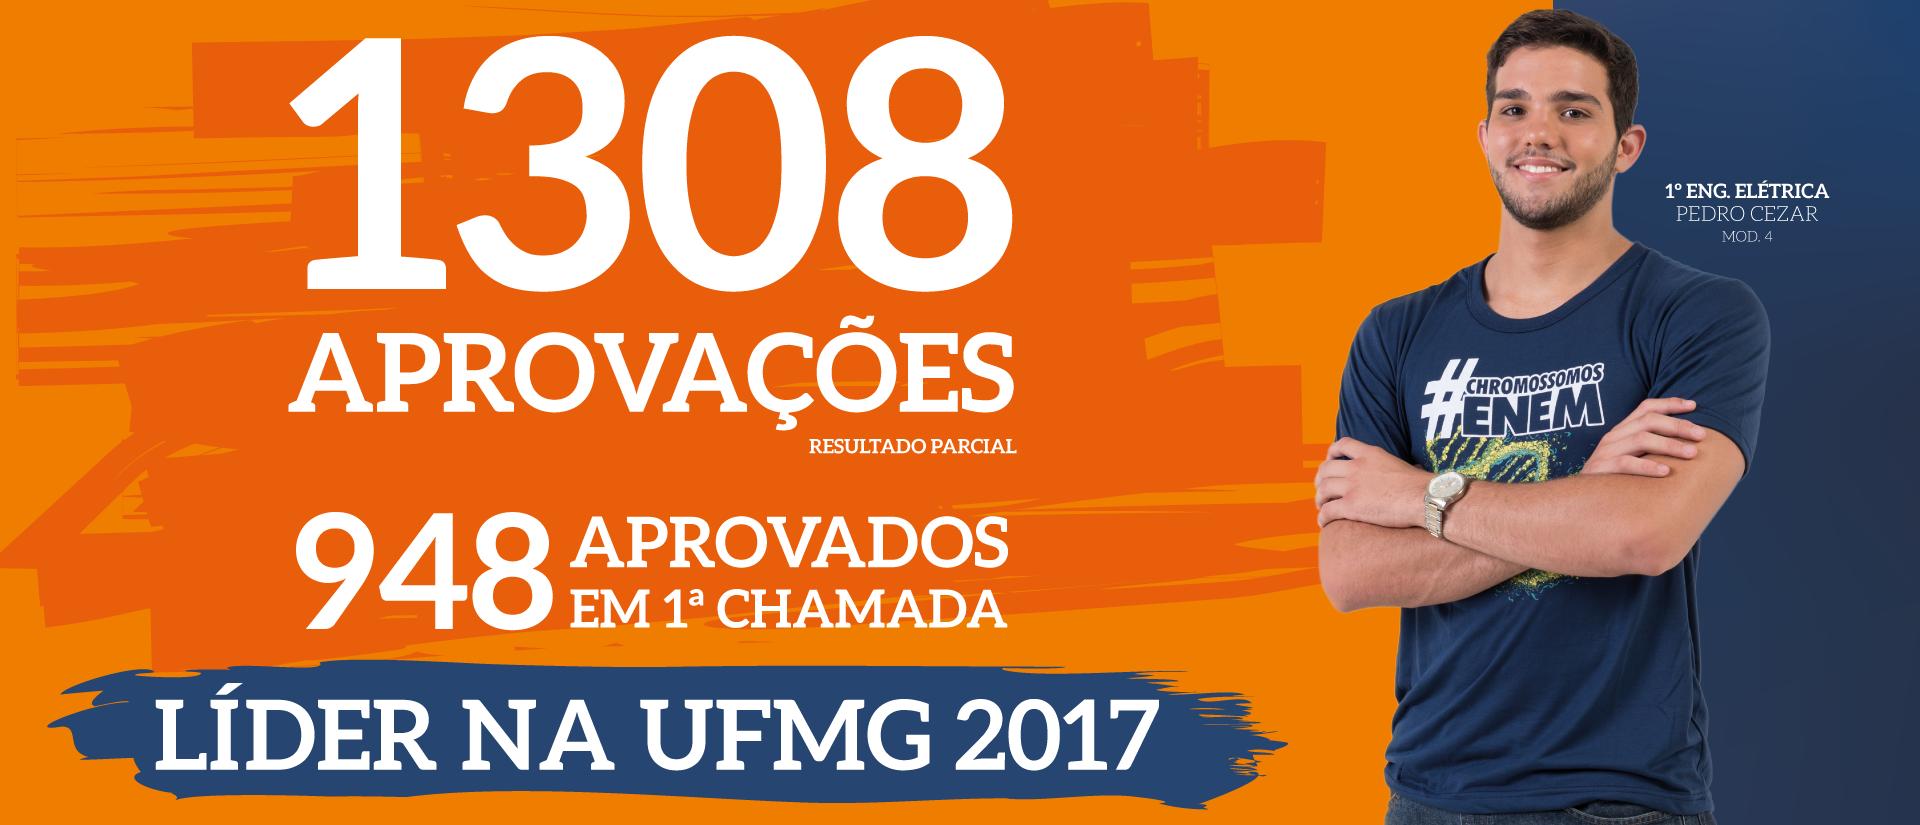 capa_home_aprovados_ufmg_resultadoparcial_2017